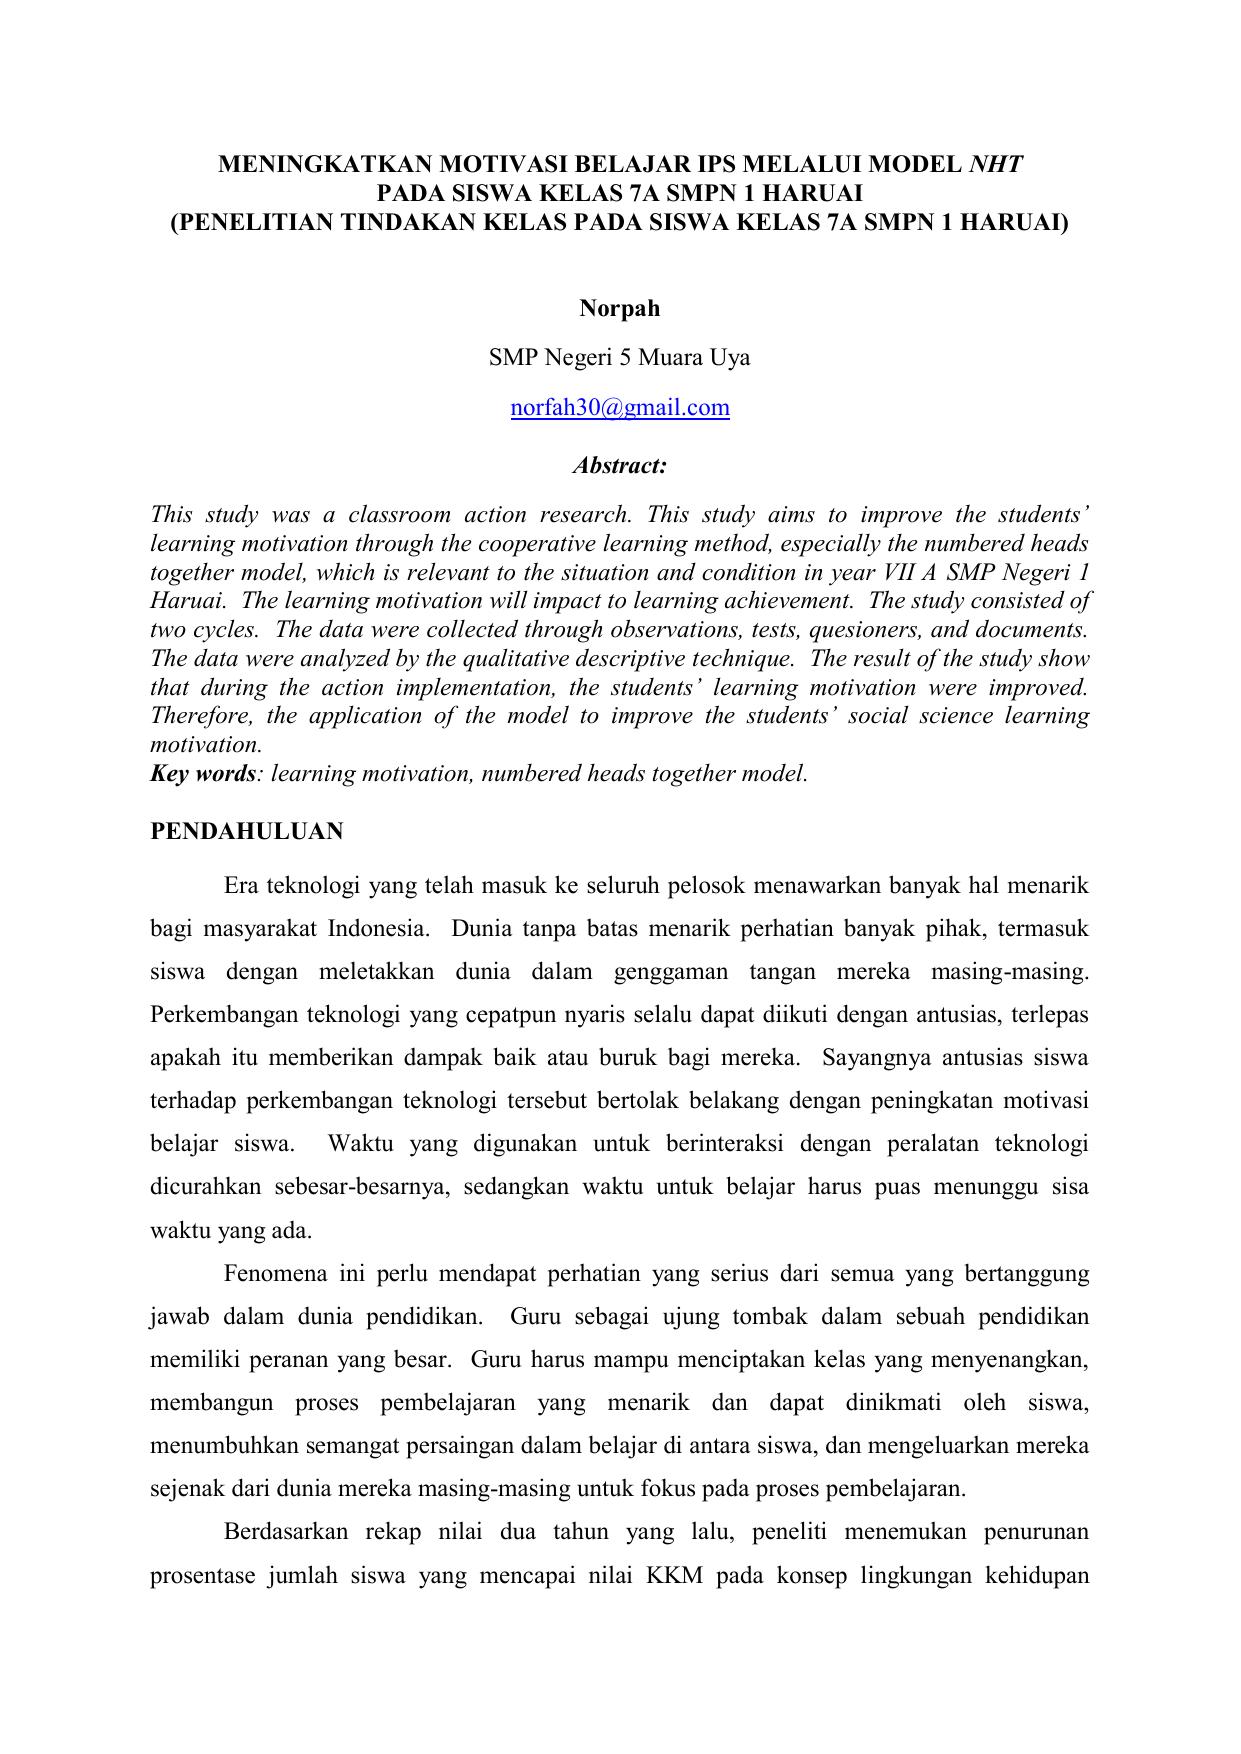 Meningkatkan Motivasi Belajar Ips Melalui Model Nht